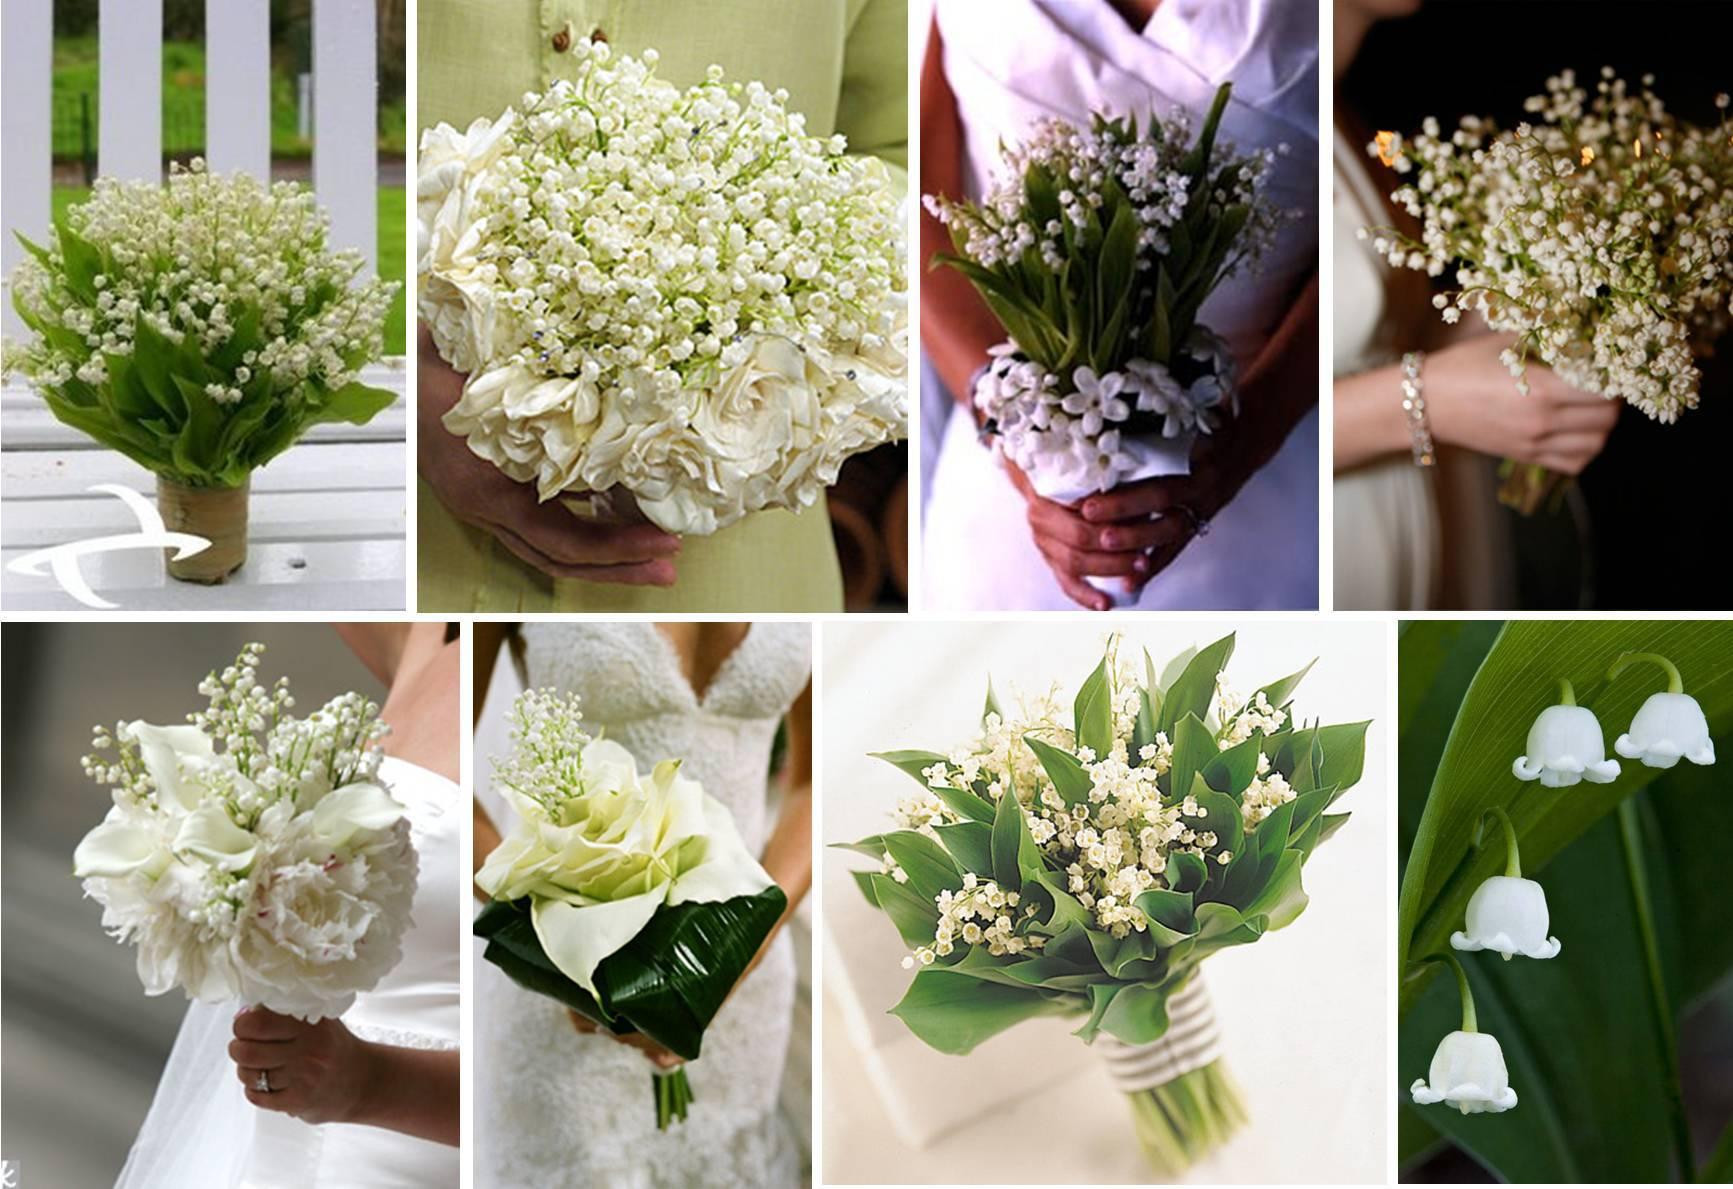 lifestyle category weddings prague czech republic wedding florists flower shops